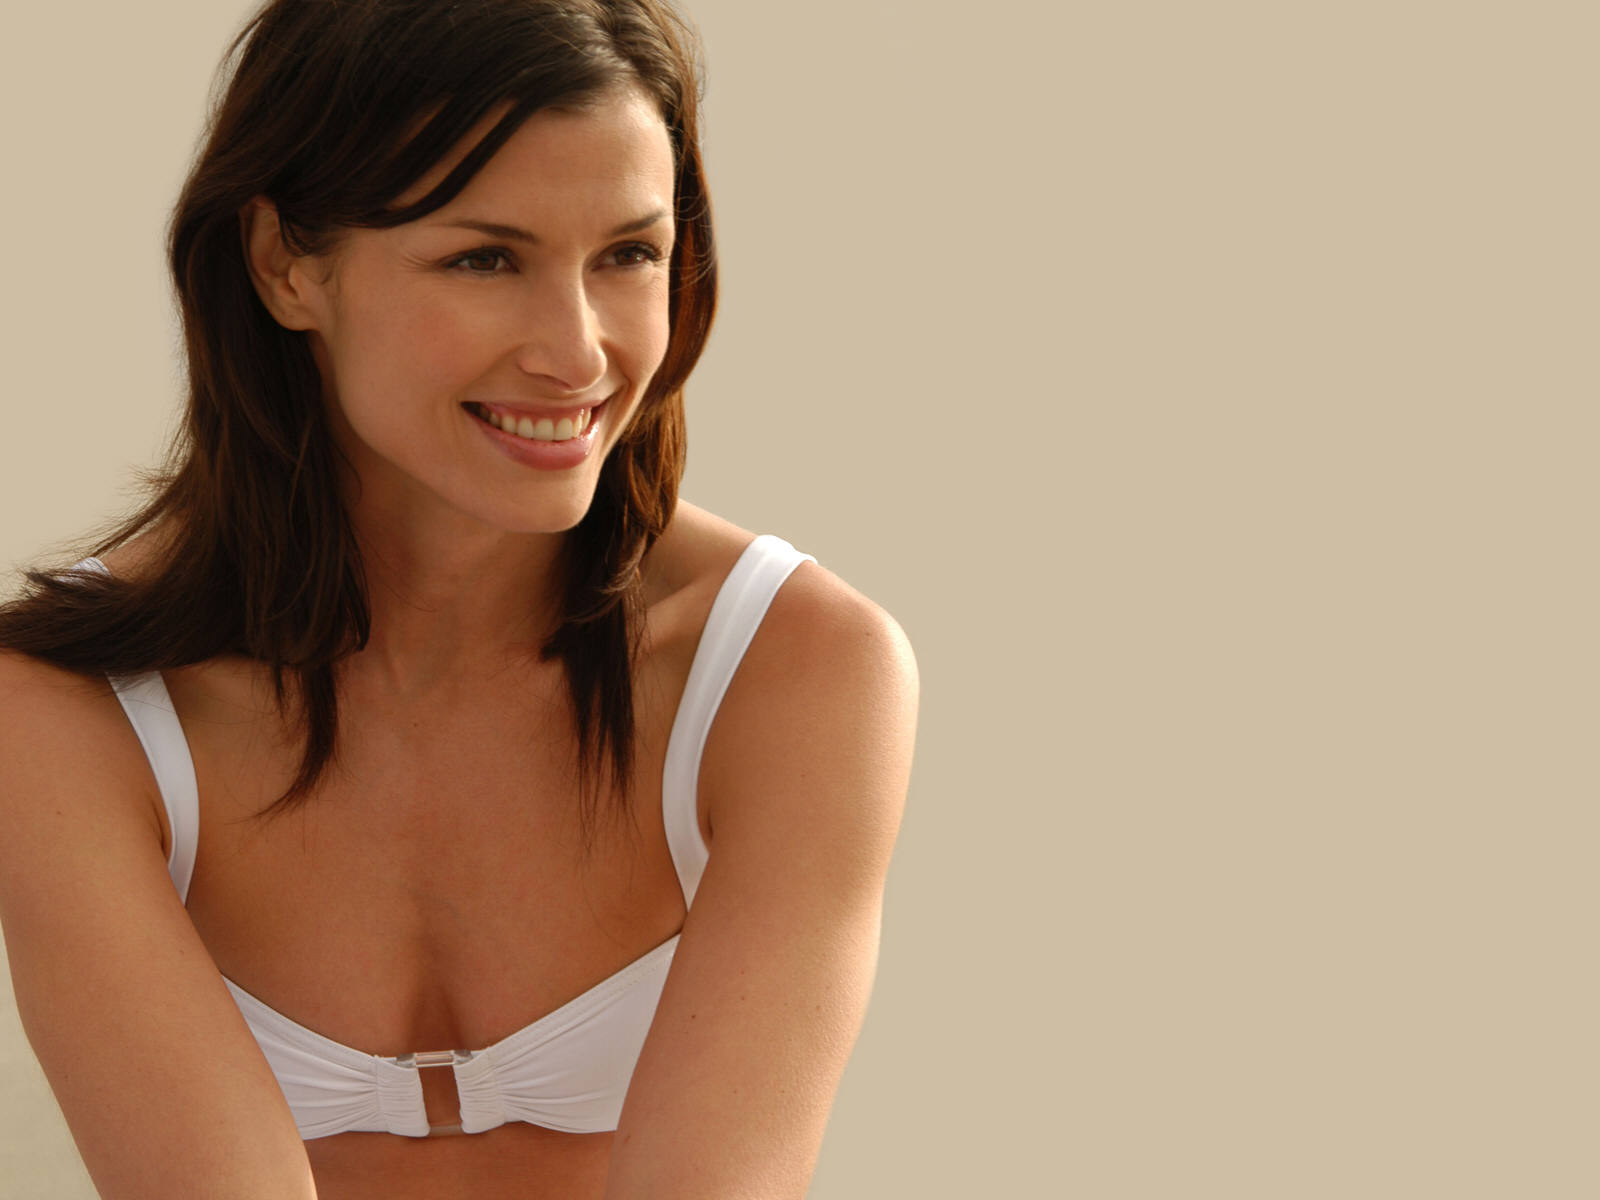 Sexy Bridget Moynahan 43